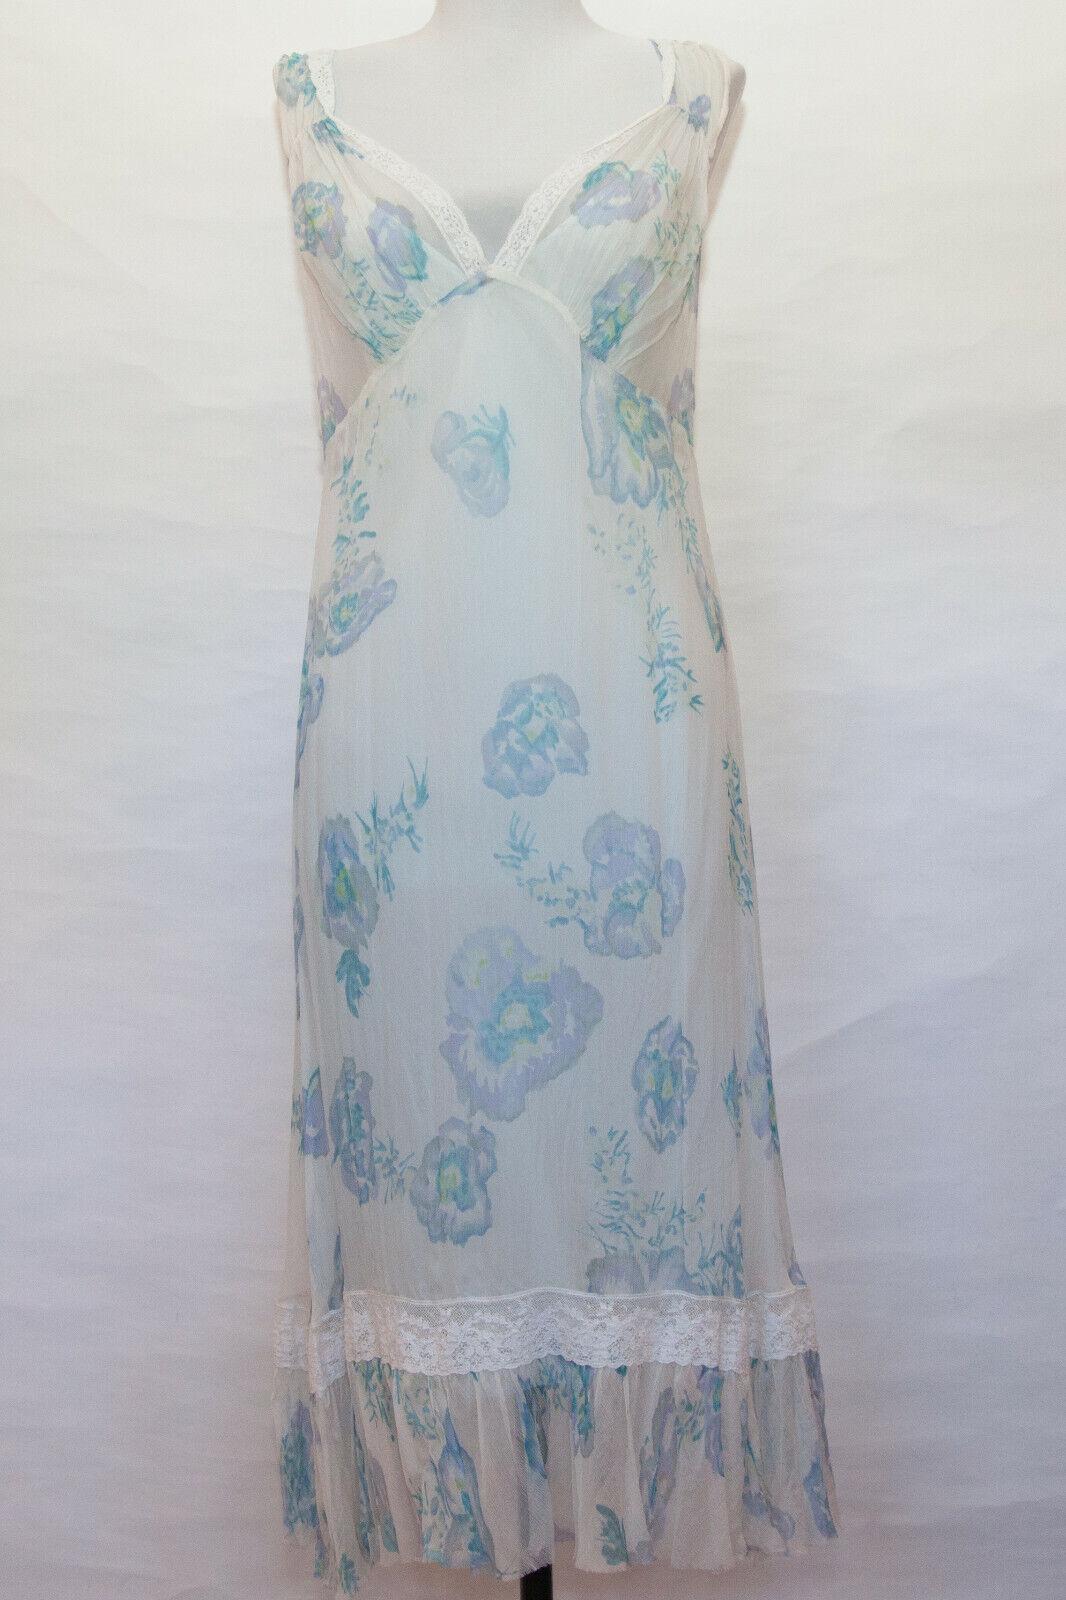 Rebecca Taylor silk Blau Floral Dress NWT Sz 8 but fits like a Größe 4. Bust 34